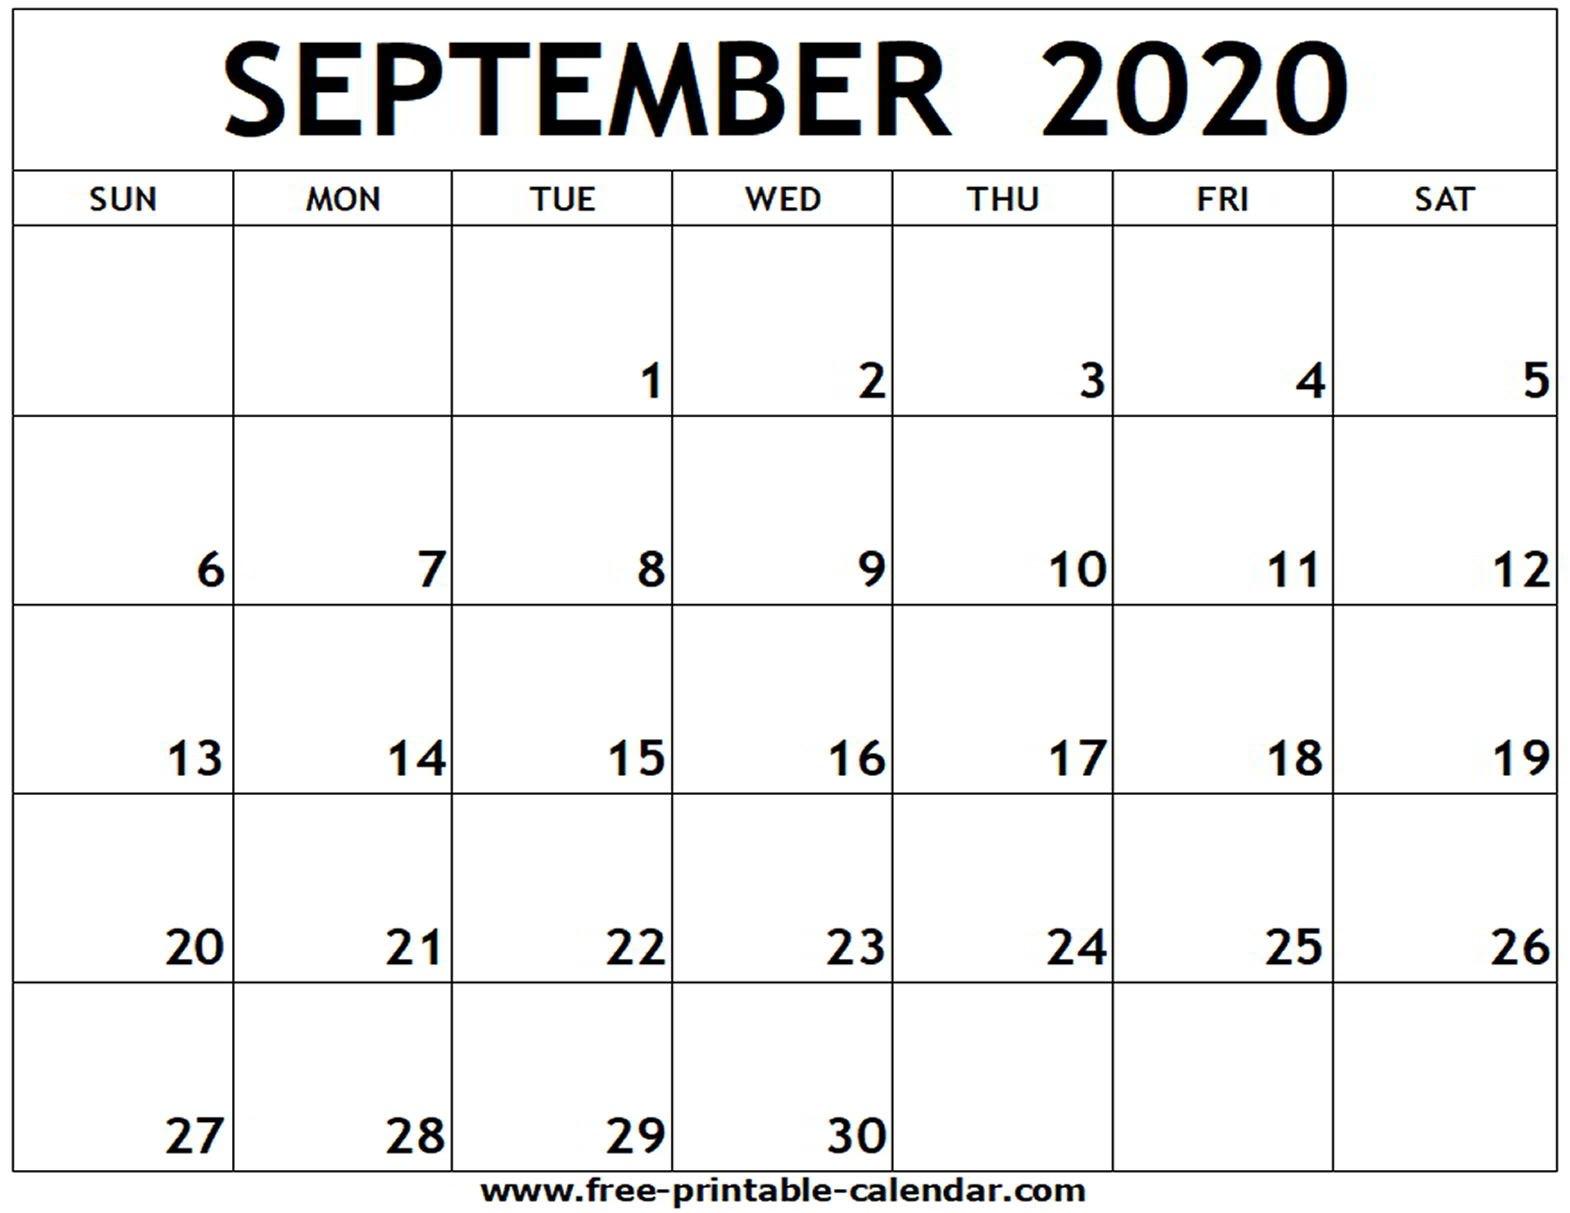 September 2020 Printable Calendar - Free-Printable-Calendar-Blank Calendar 2020 Printable Uk